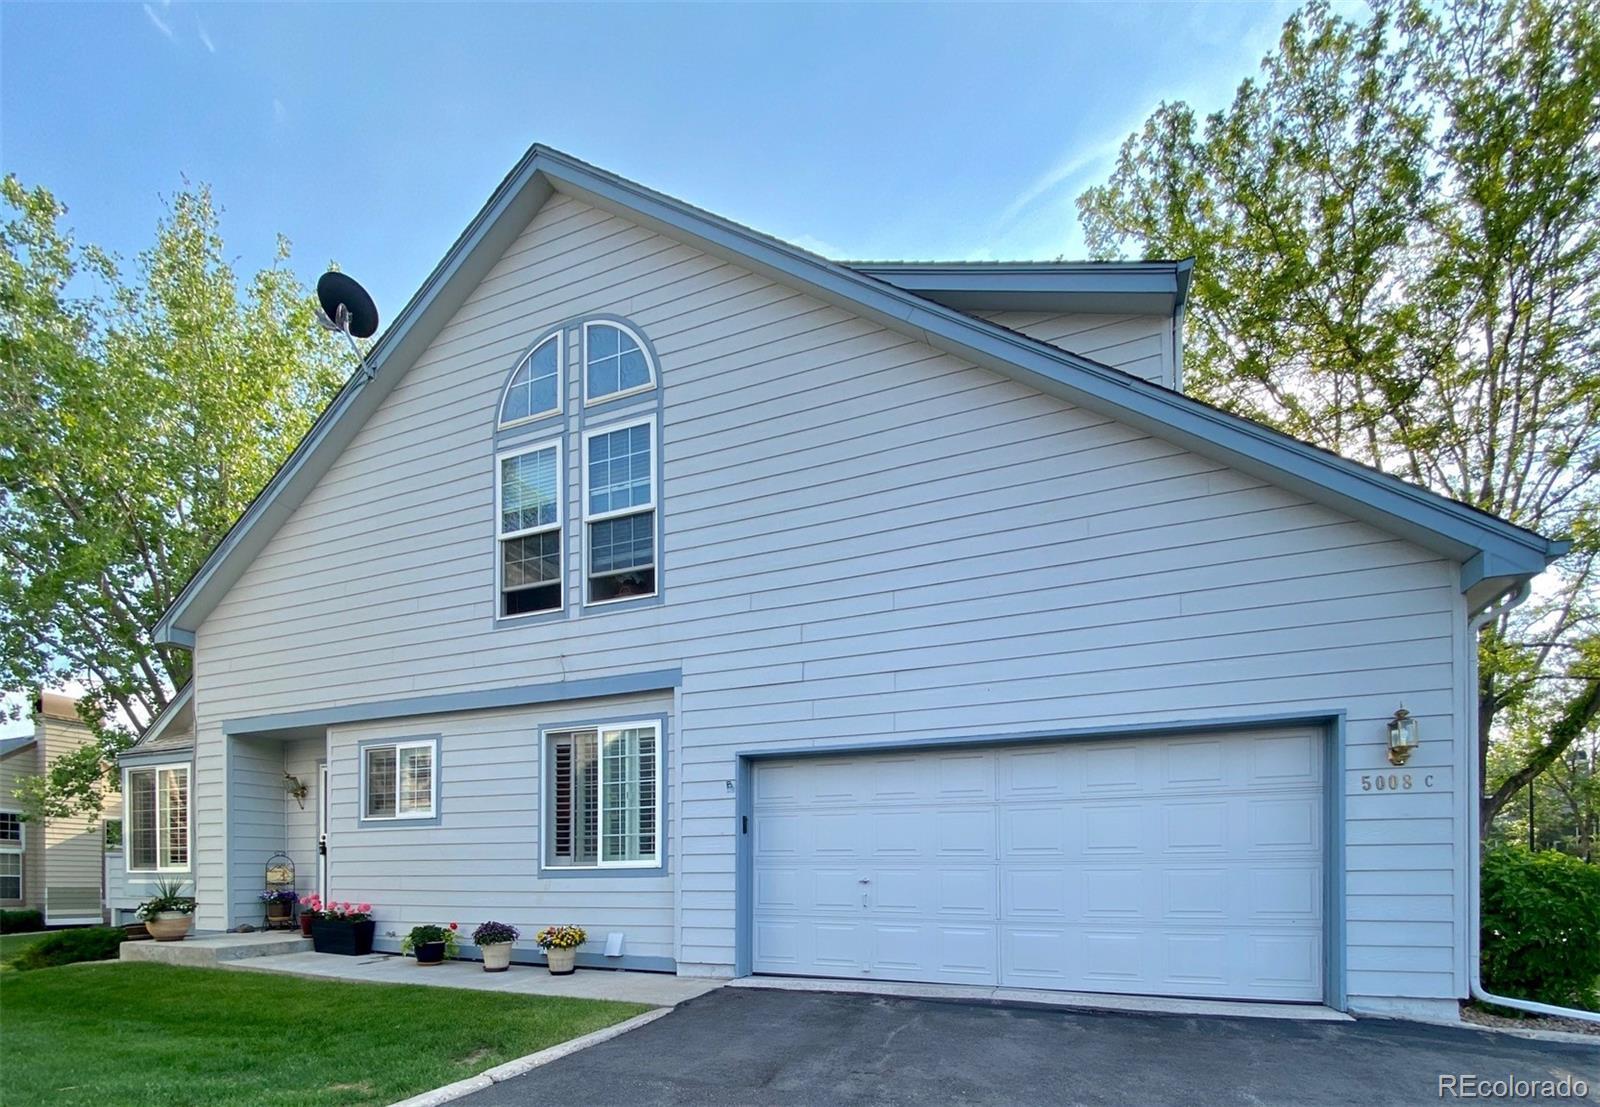 5008 S Nelson Street #C Property Photo - Littleton, CO real estate listing